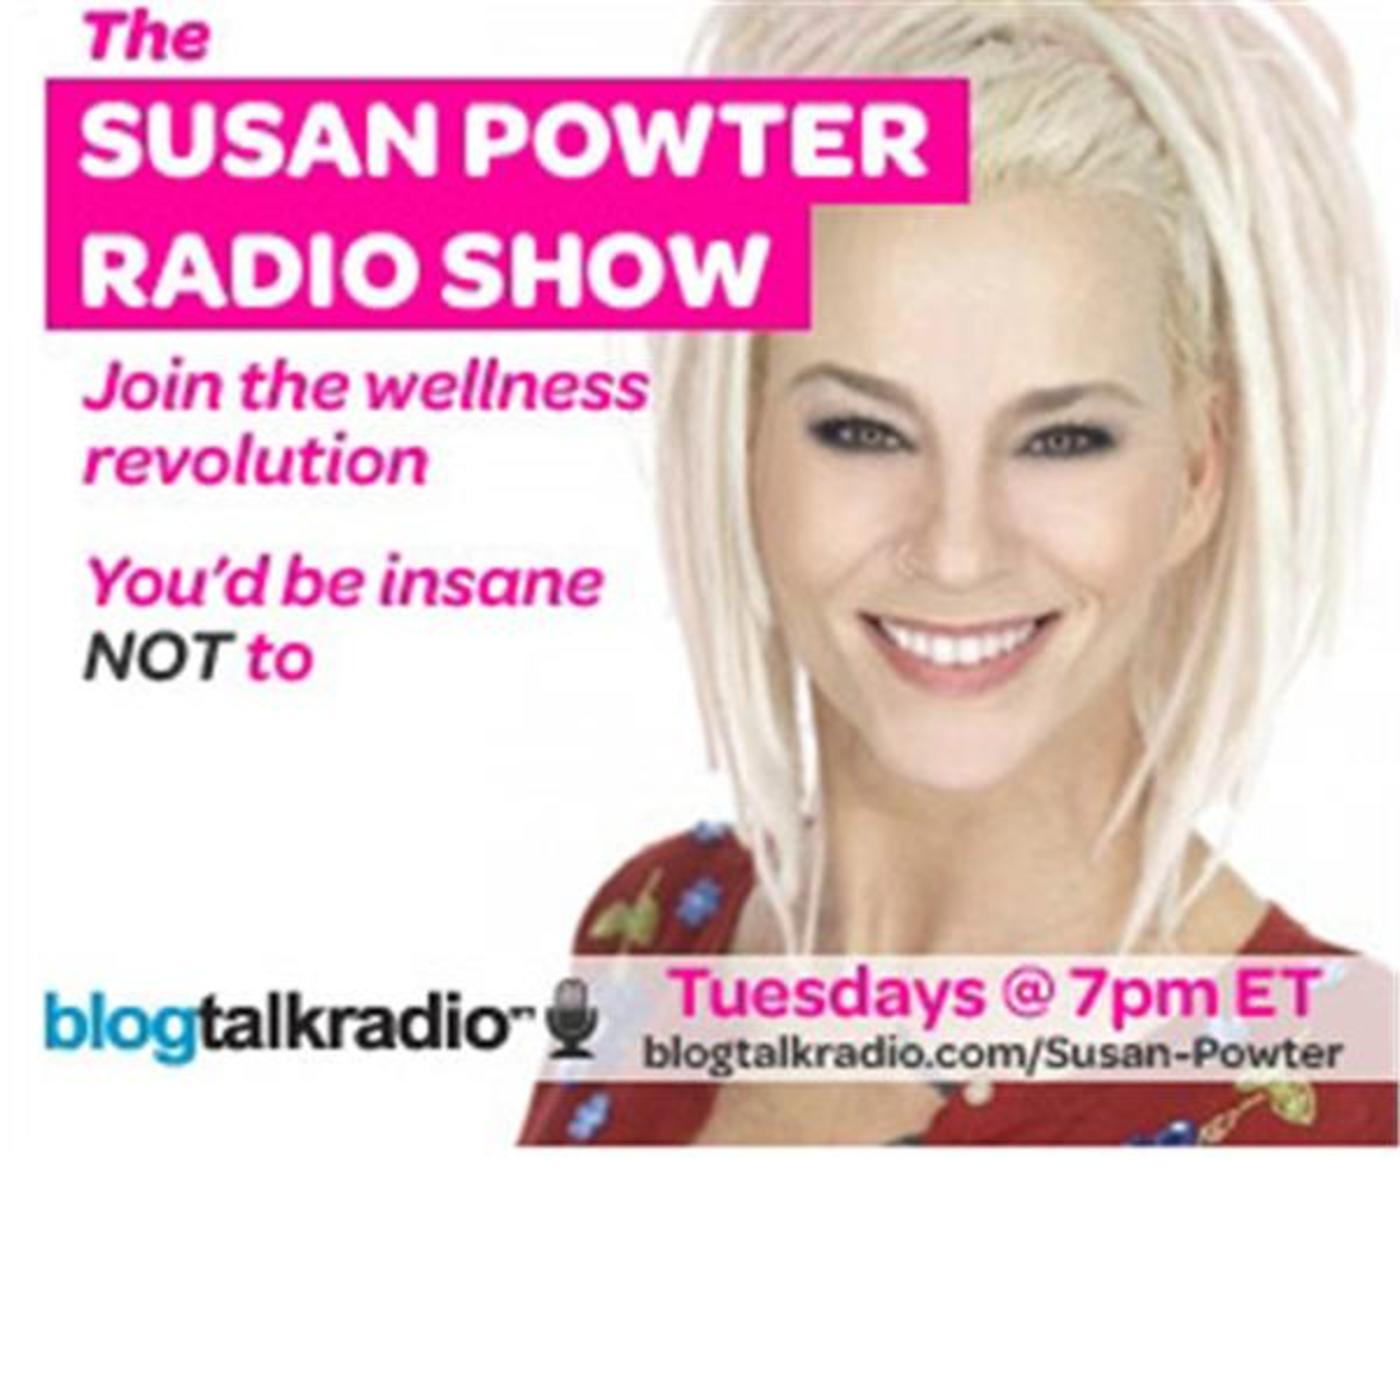 The Susan Powter Radio Show